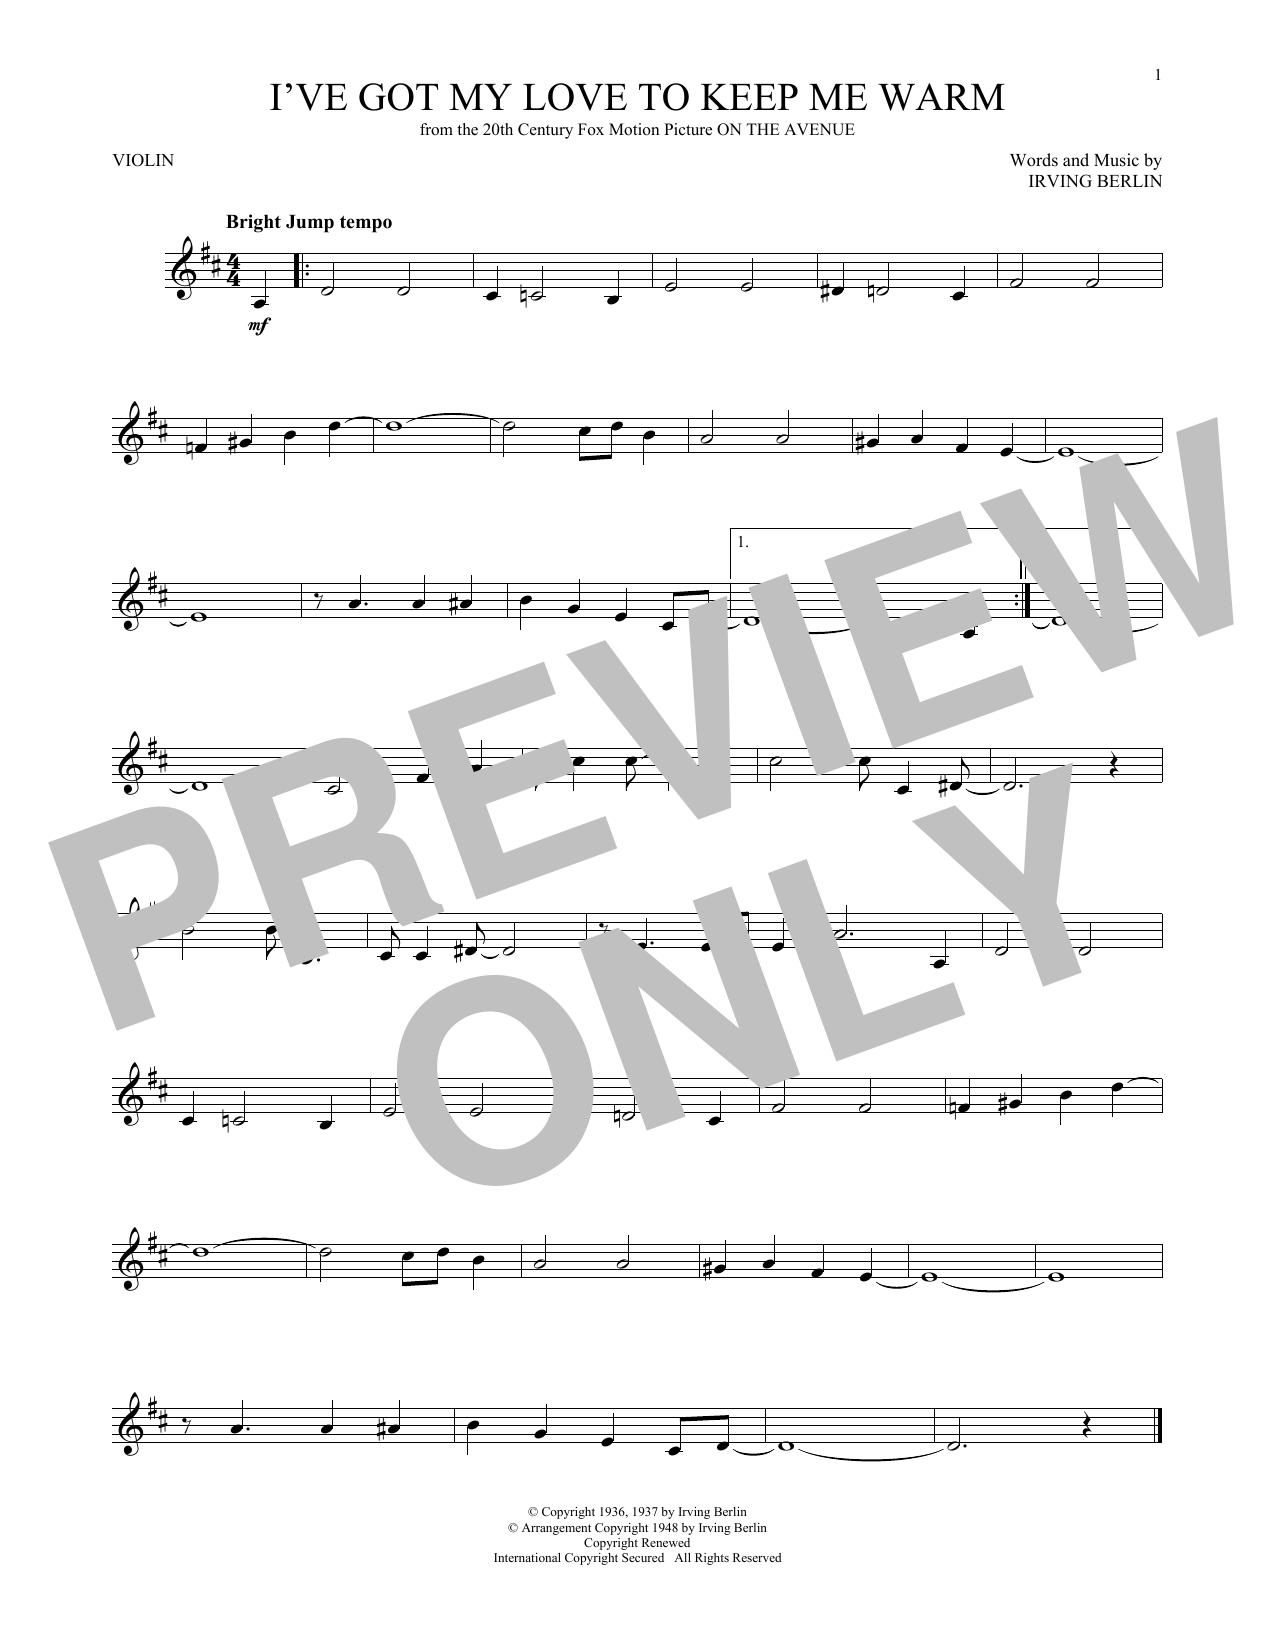 Violin sheet music at stantons sheet music benny goodman ive got my love to keep me warm hexwebz Choice Image